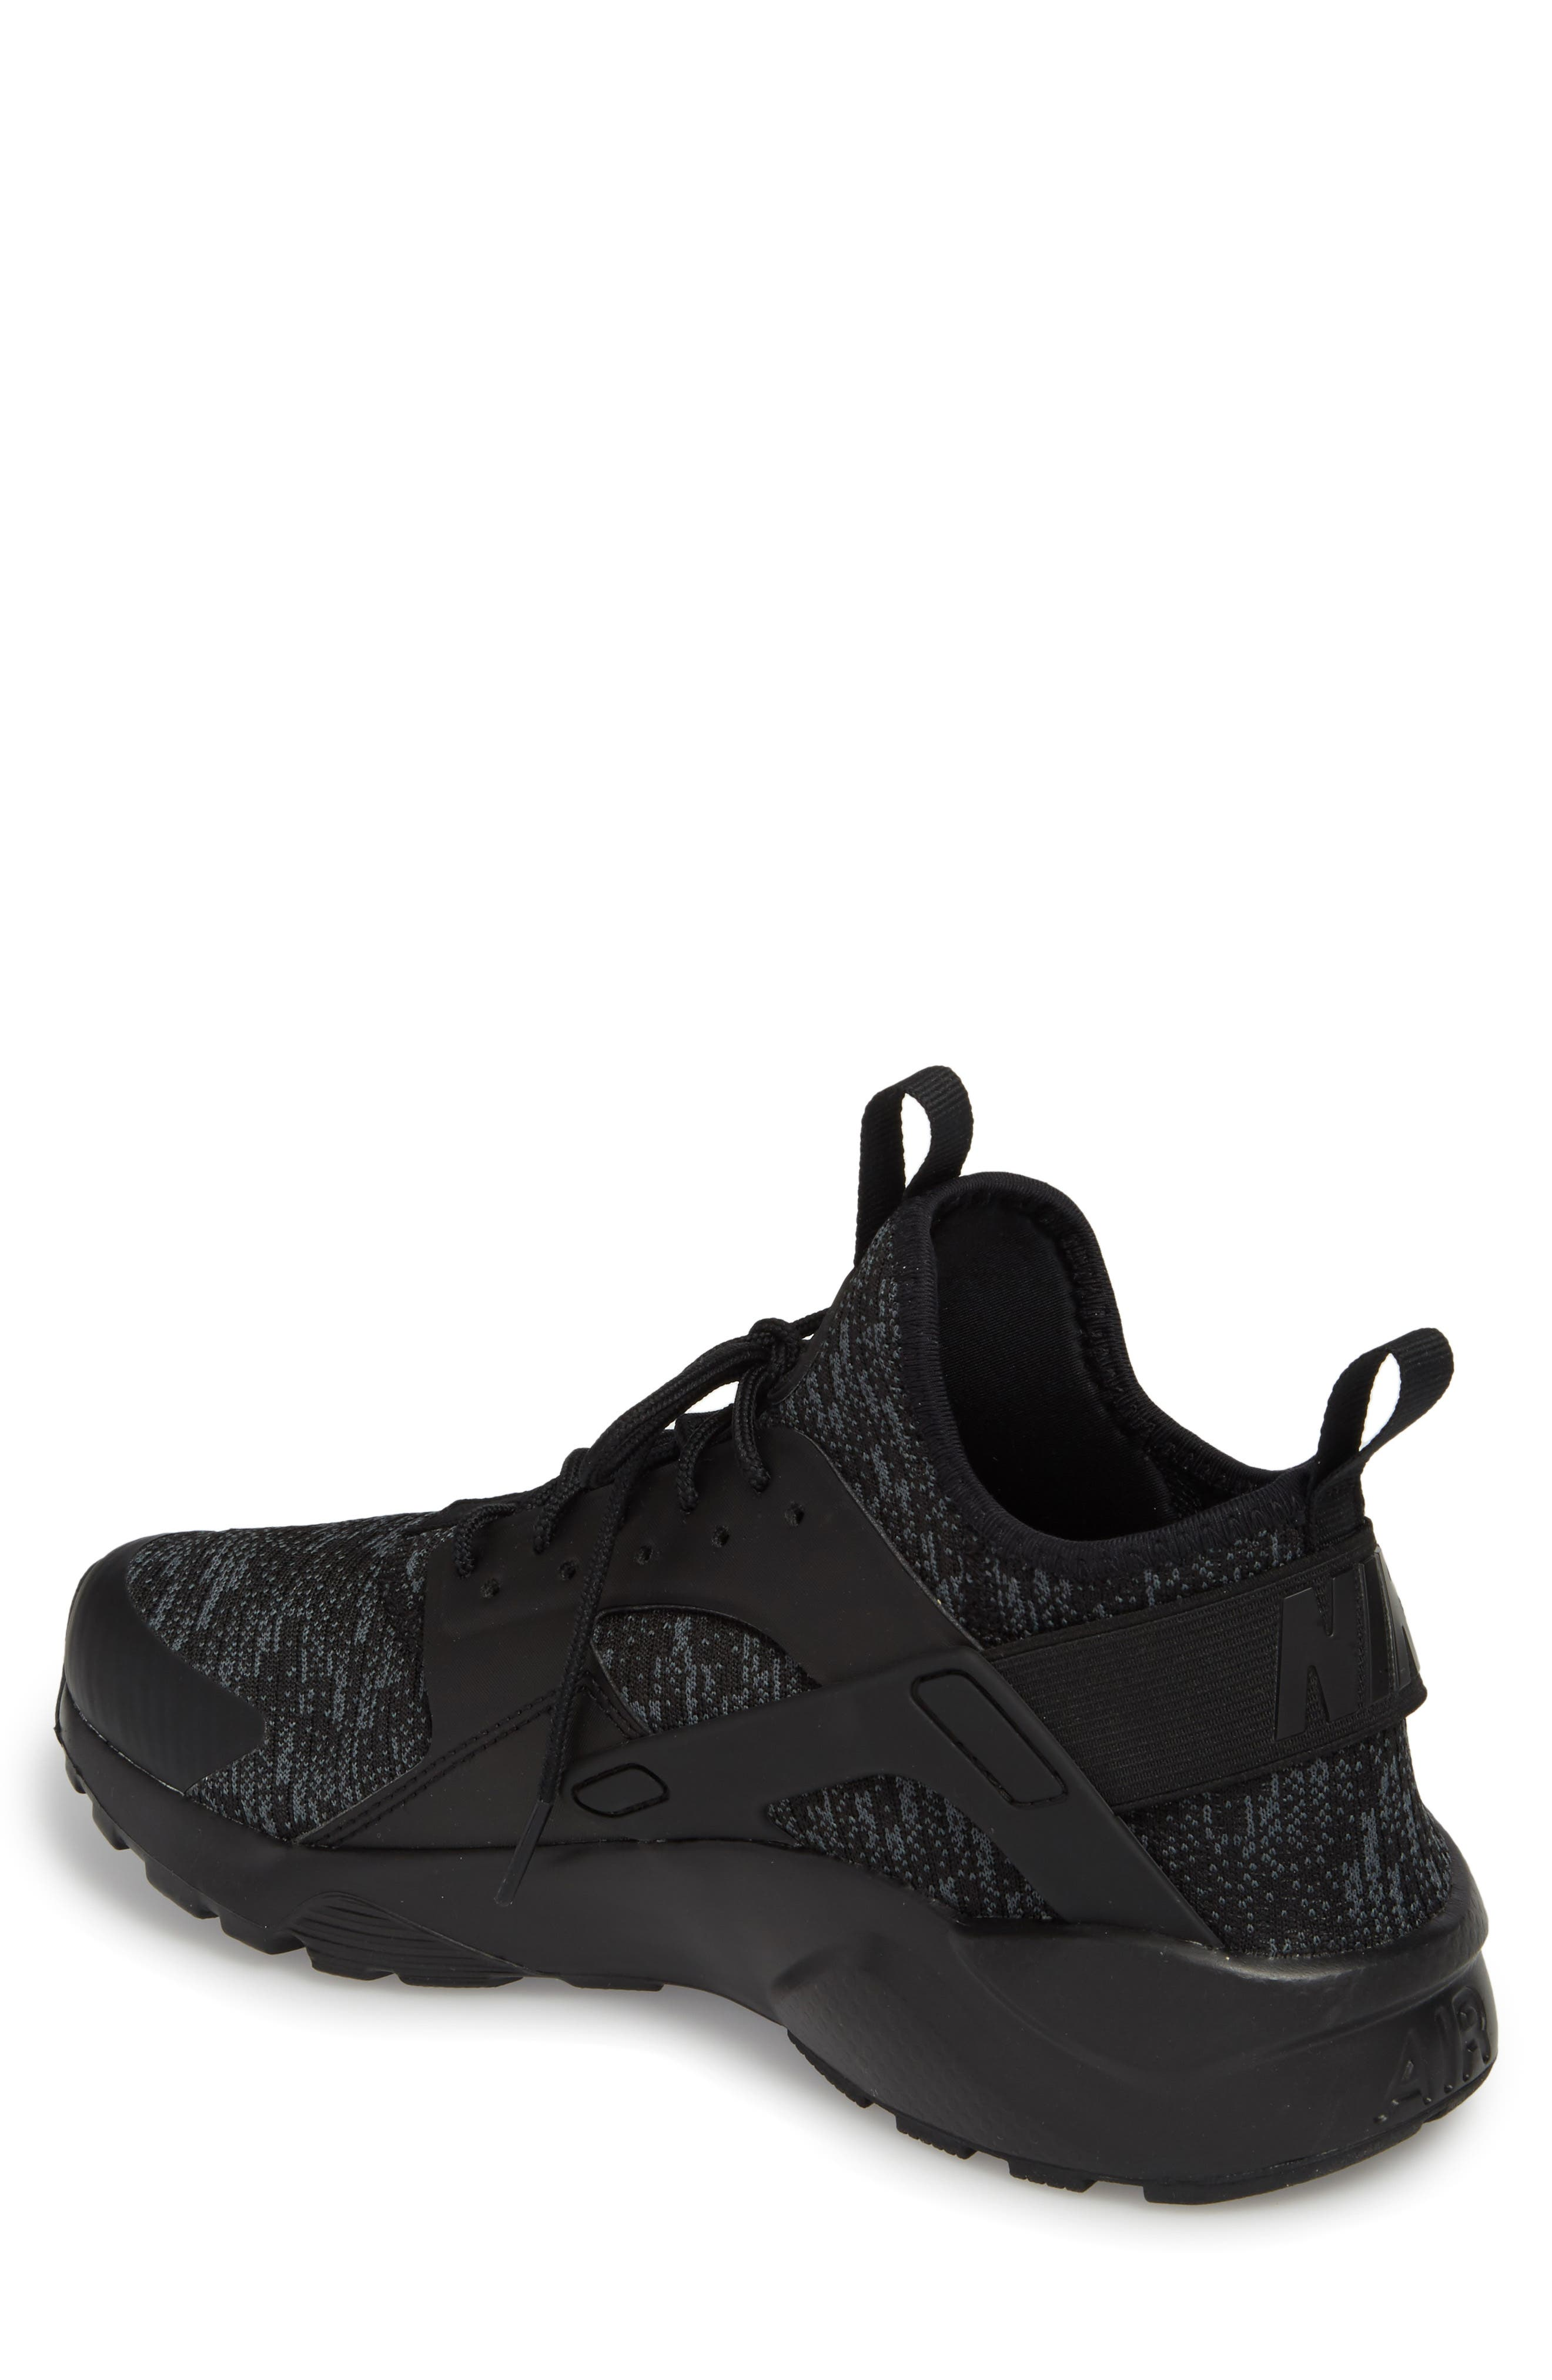 Air Huarache Run Ultra SE Sneaker,                             Alternate thumbnail 2, color,                             006